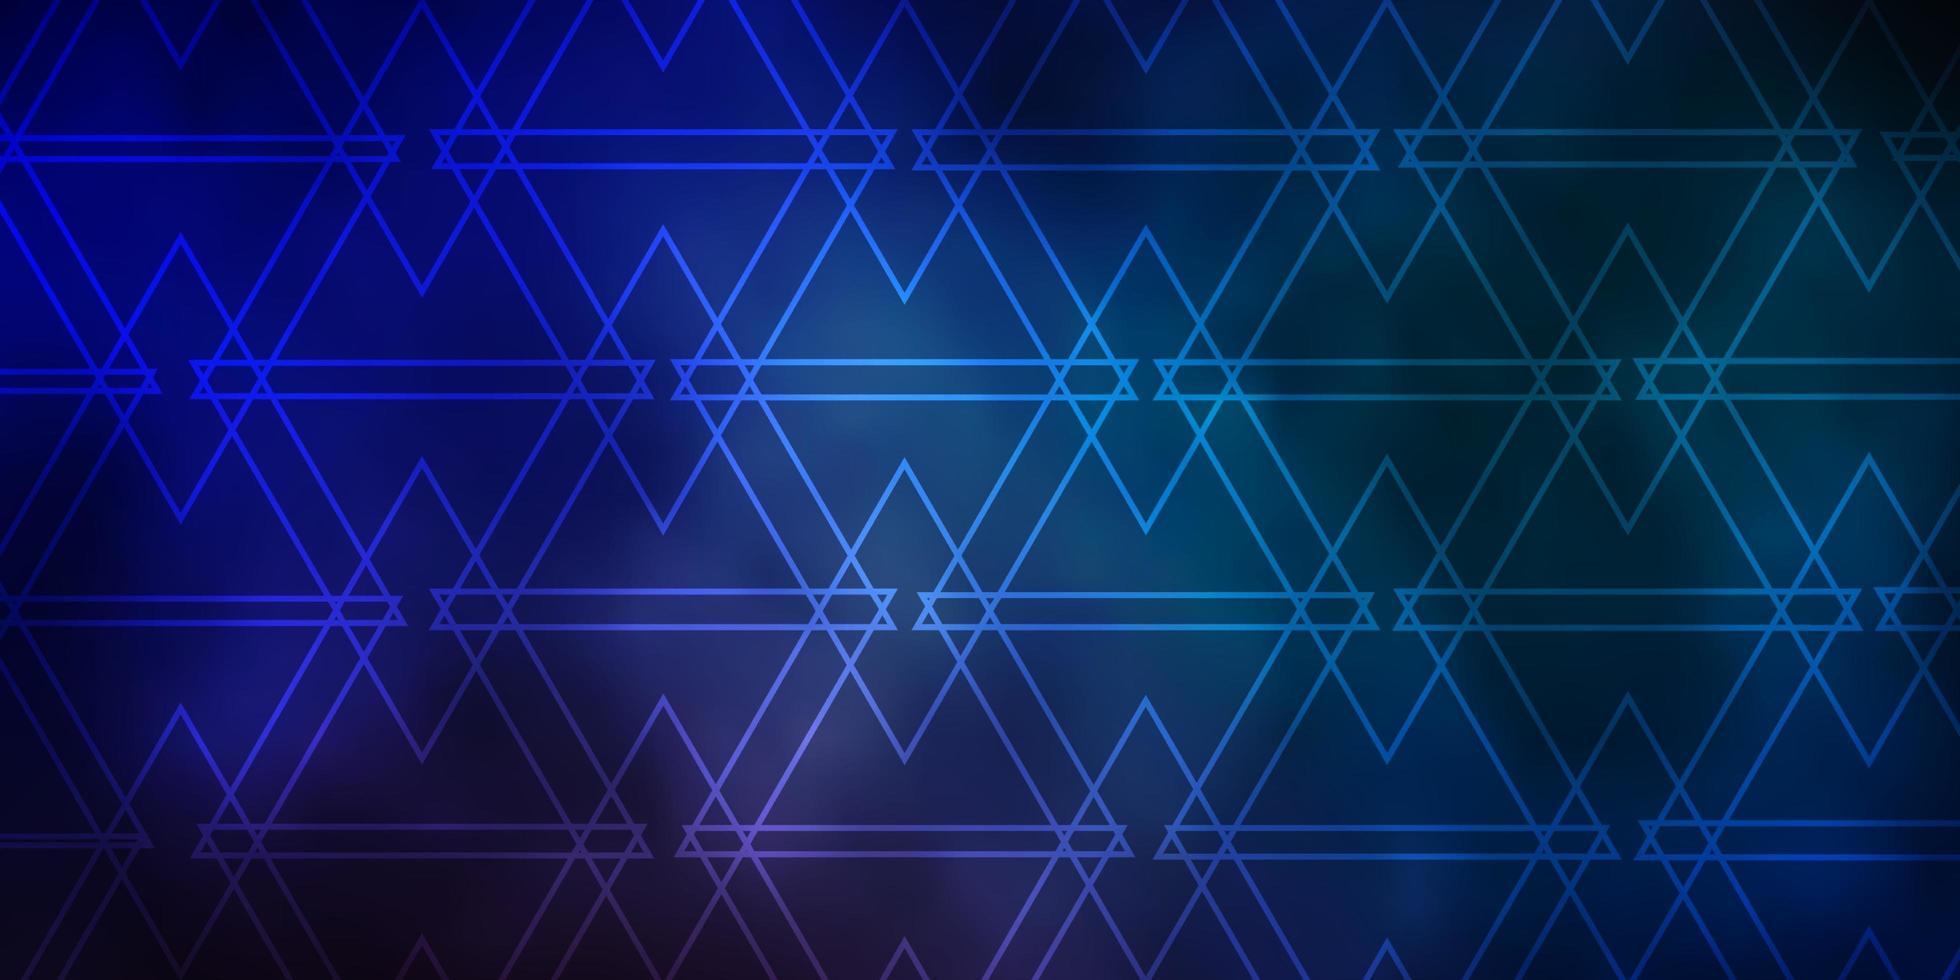 blaues Muster mit polygonalem Stil. vektor